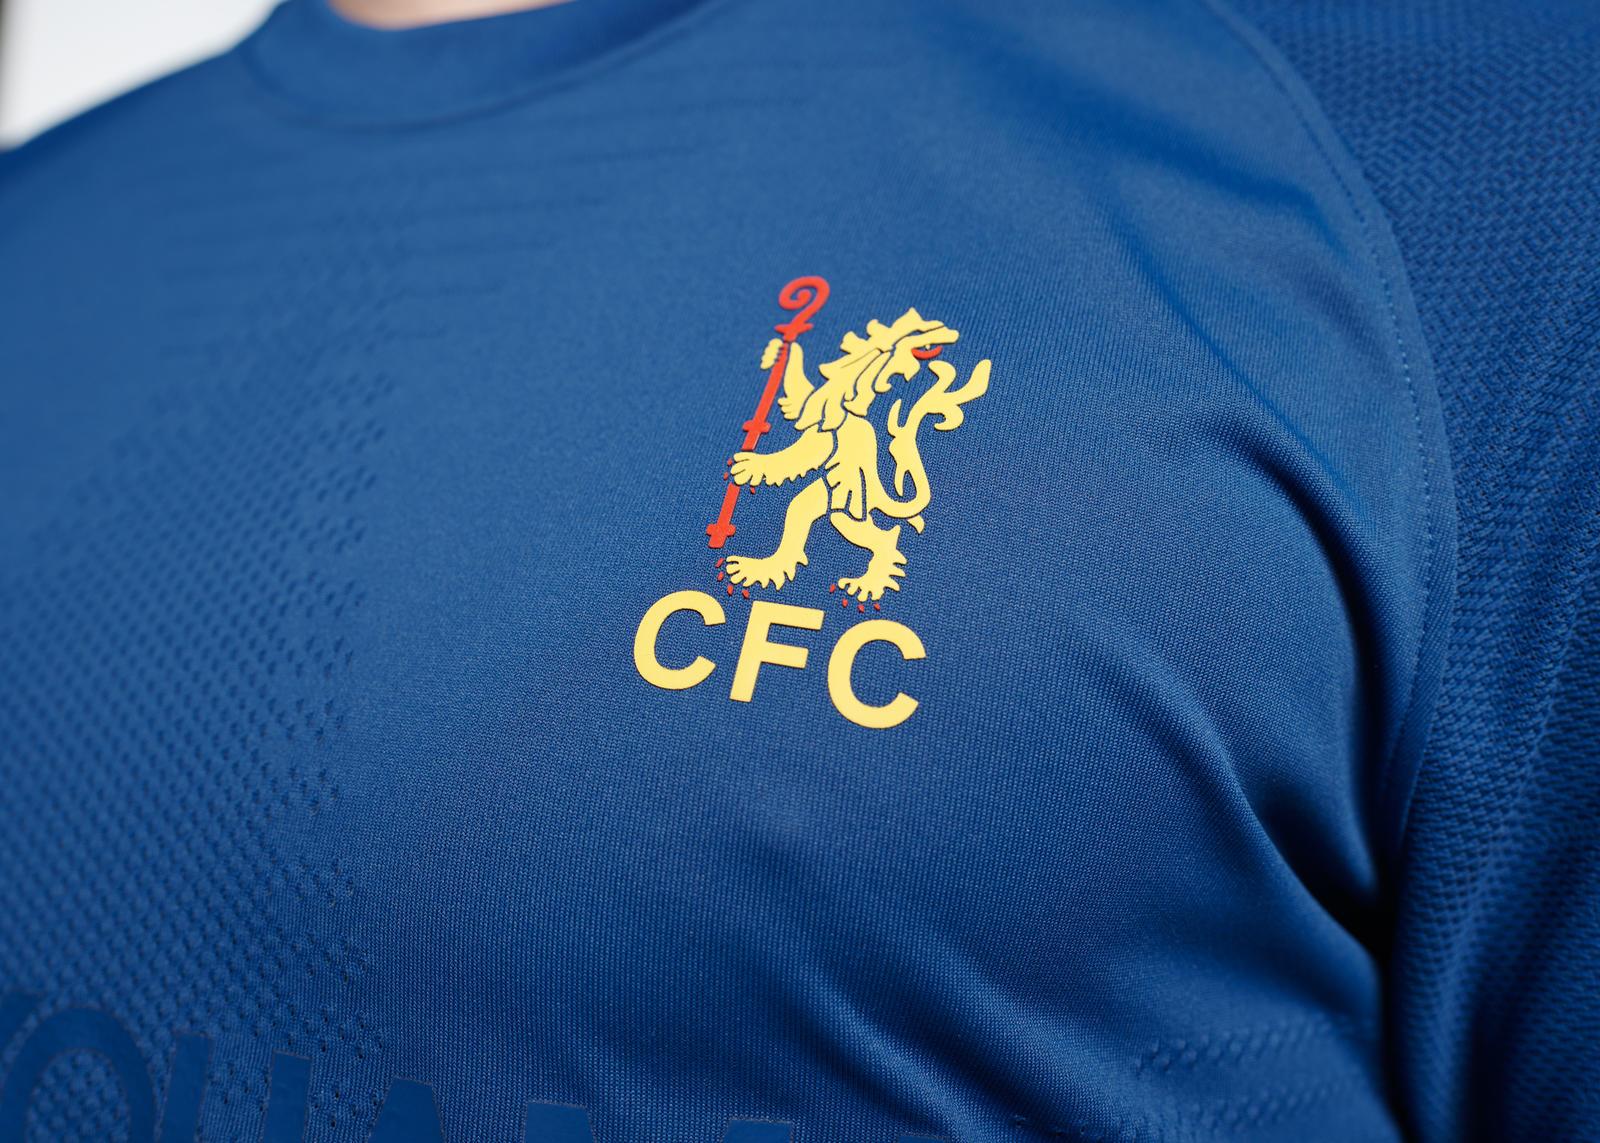 Proscrito consonante error  Chelsea Football Club 50th Anniversary Kit - Nike News